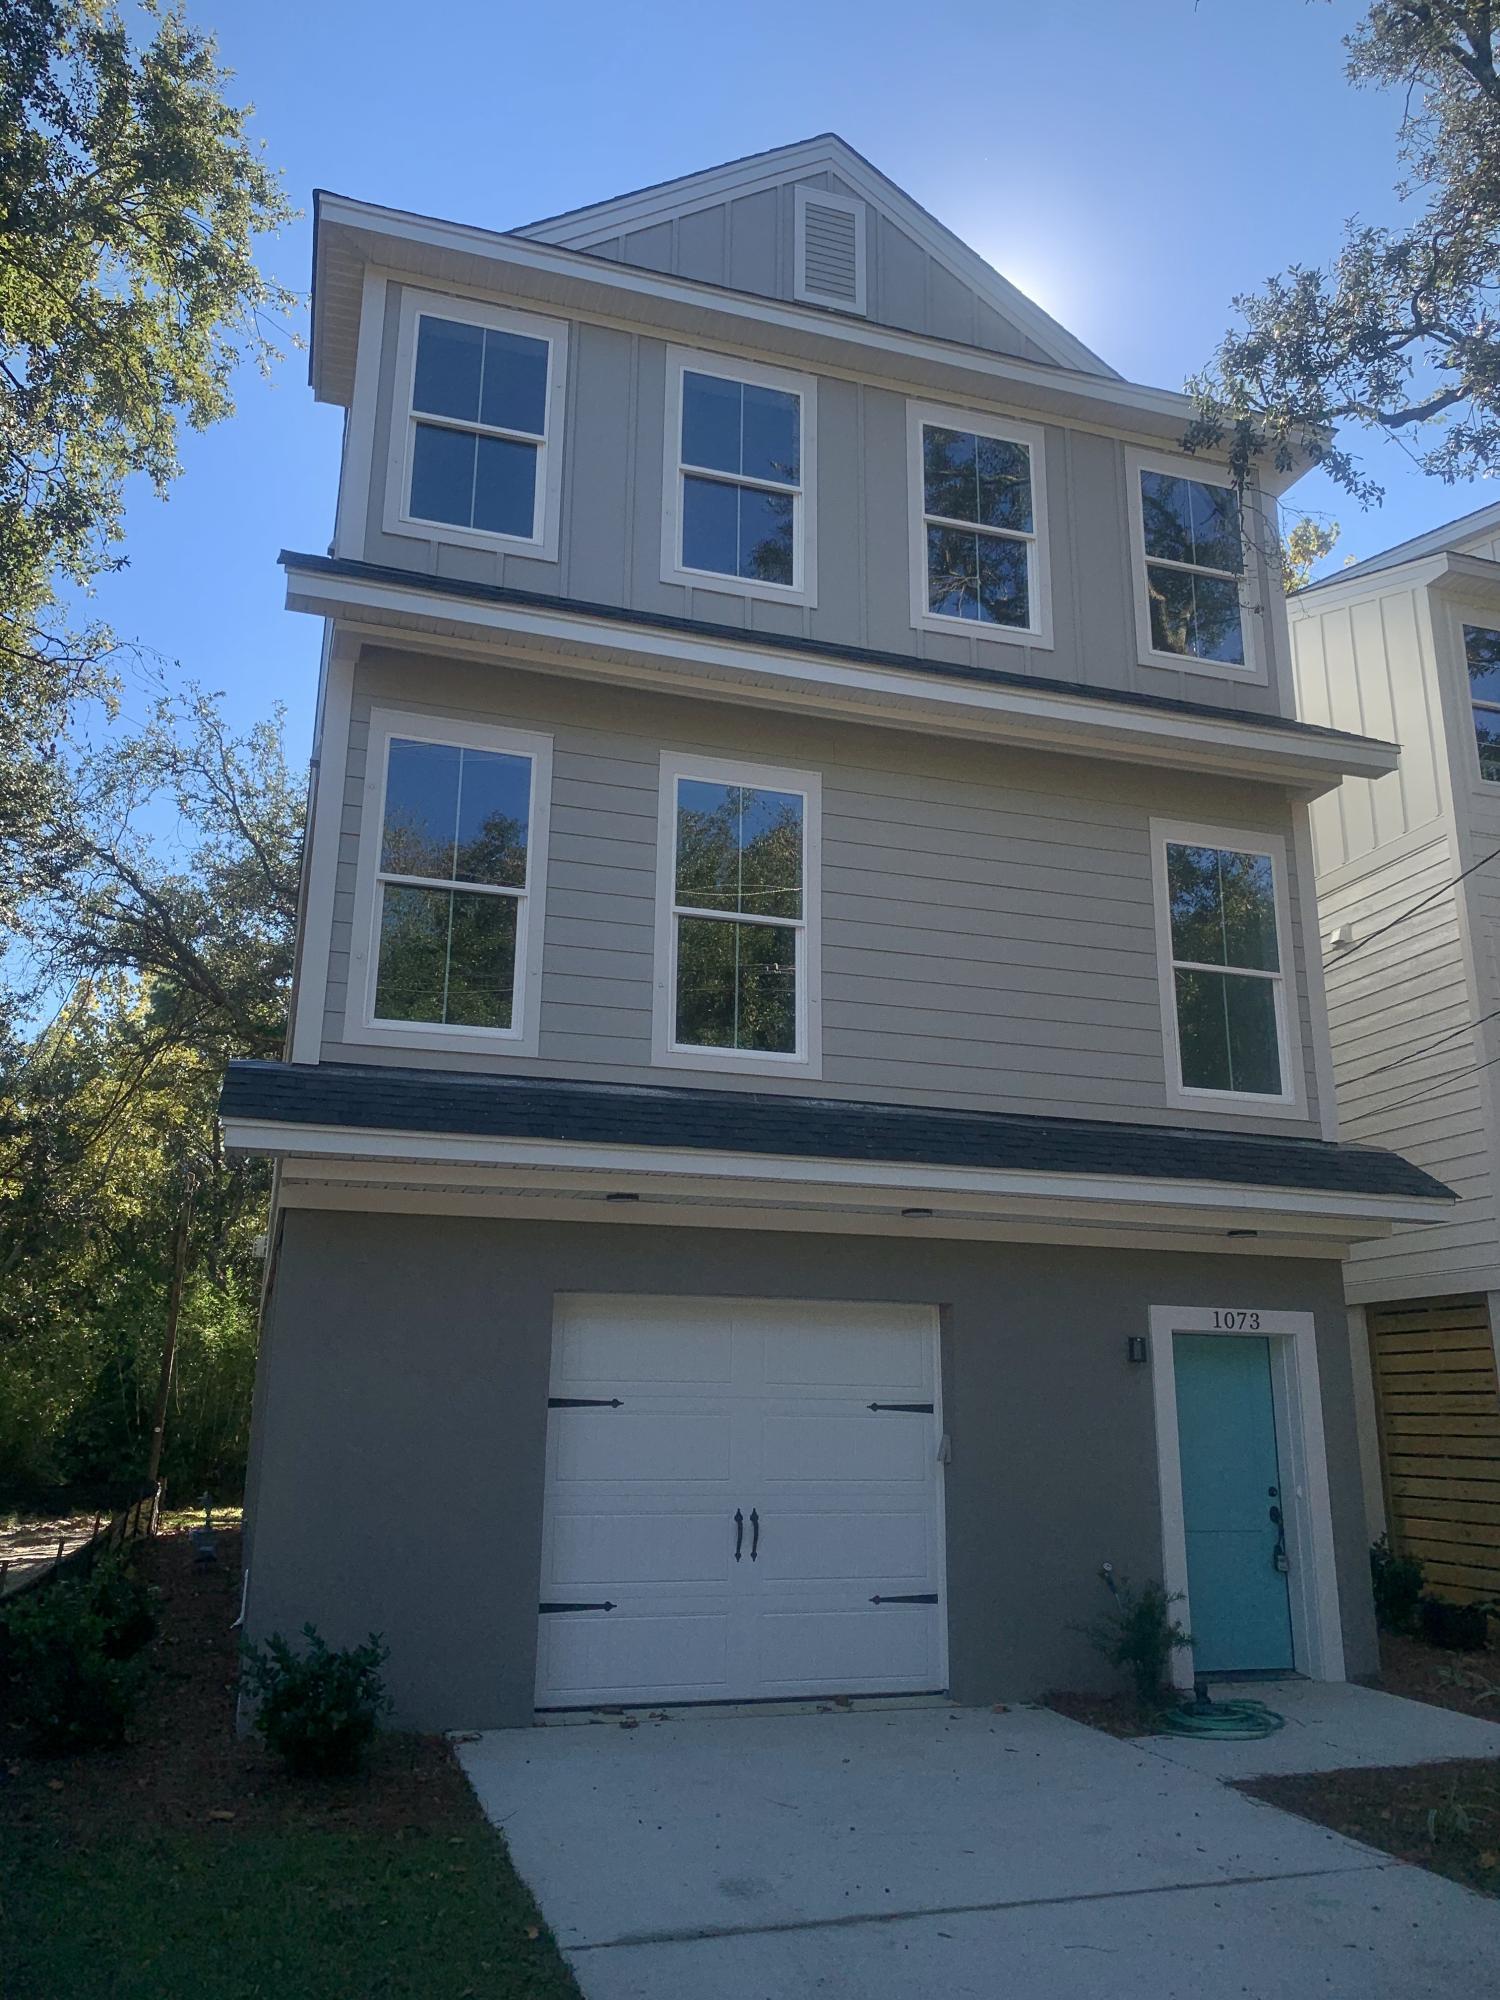 1073 Bexley Street North Charleston, SC 29405